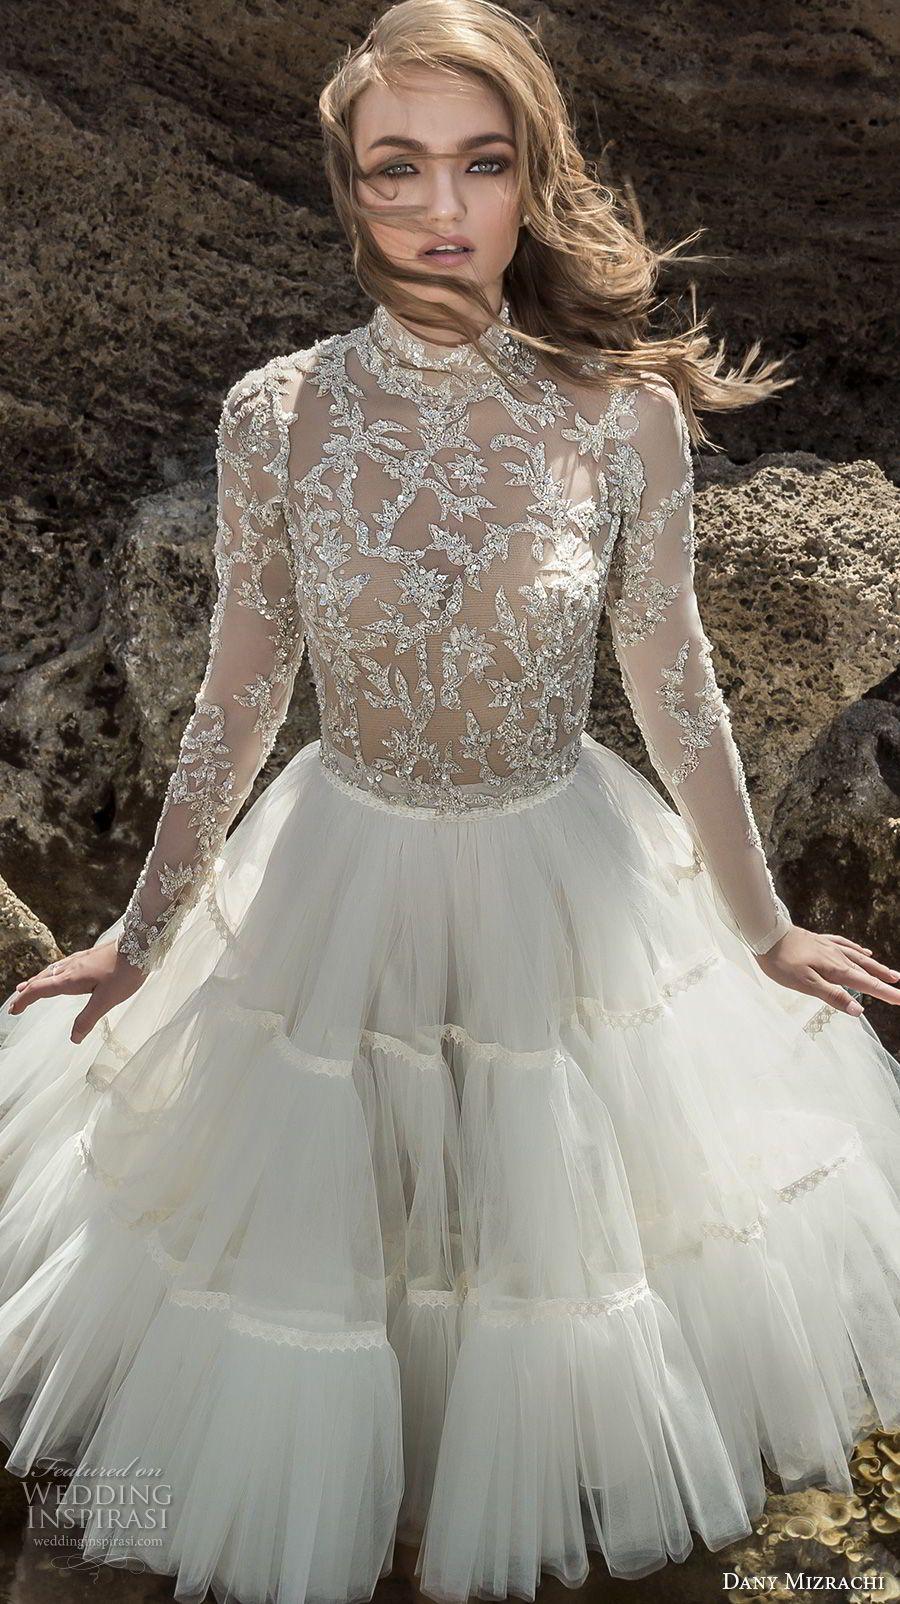 Dany mizrachi wedding dresses those dress pinterest short